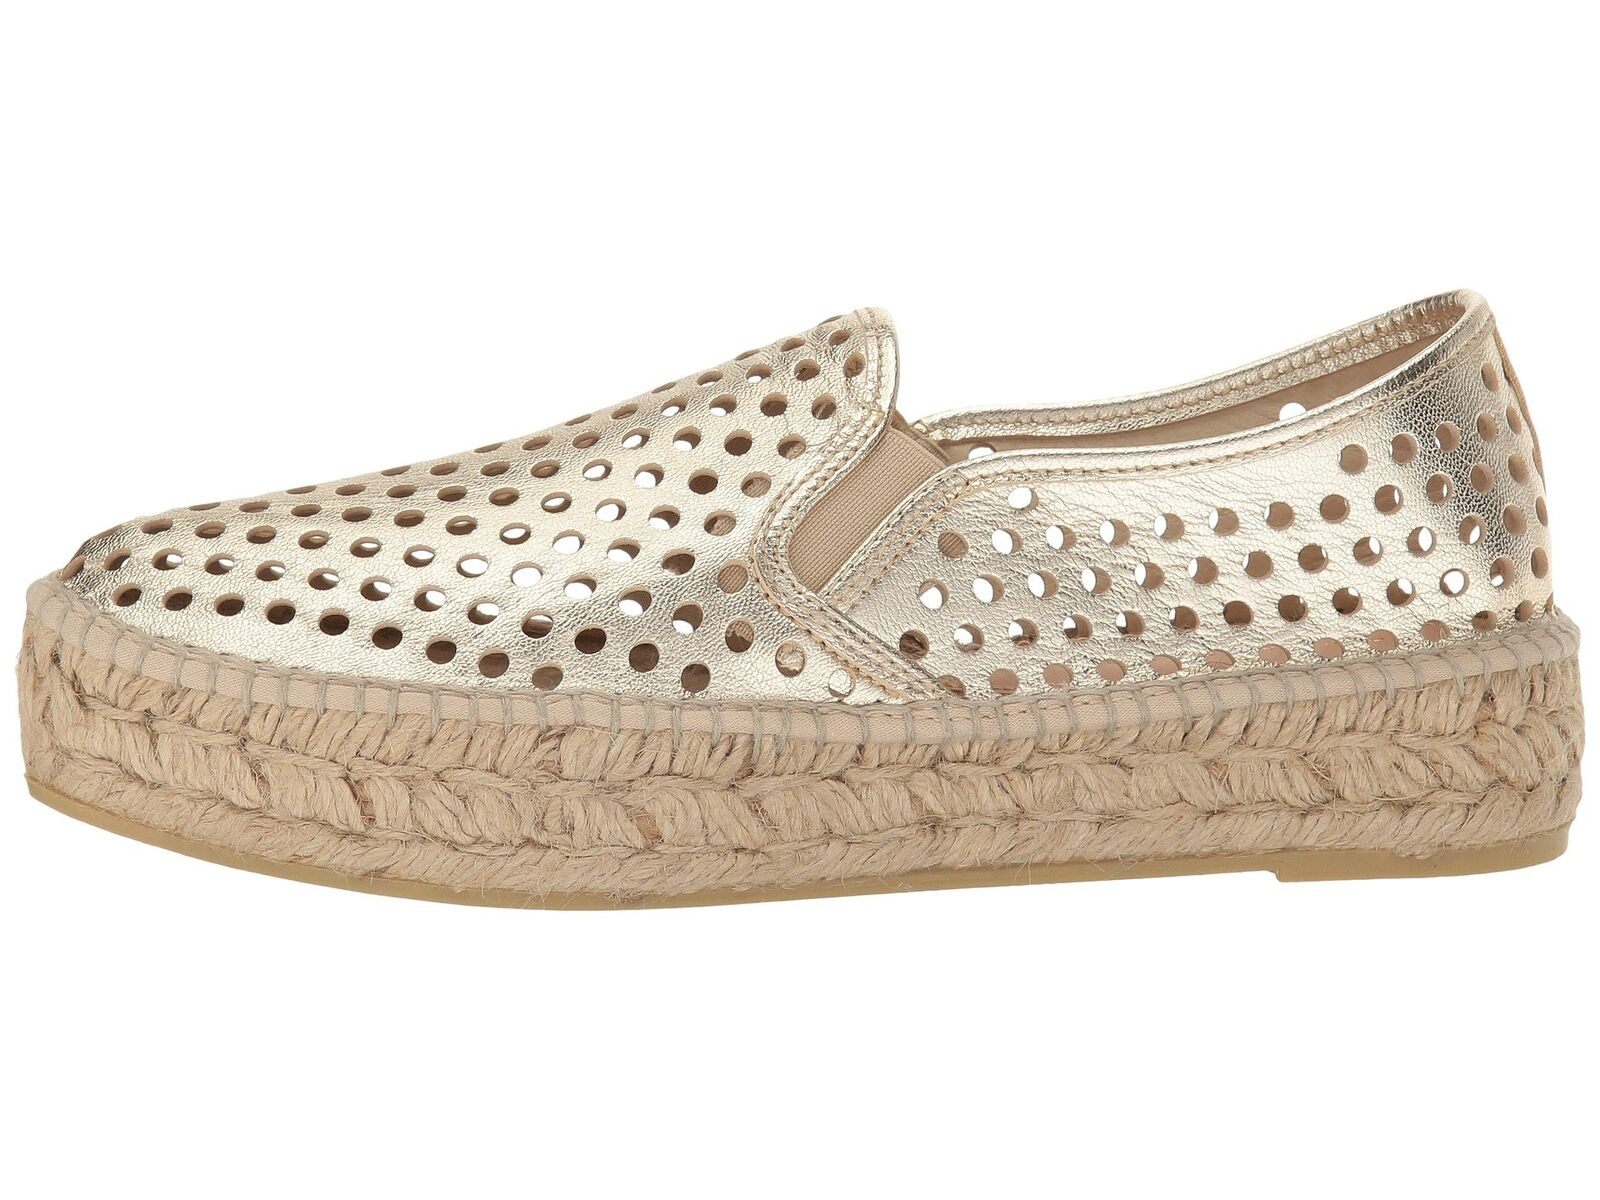 LOEFFLER RANDALL RANDALL RANDALL Rowan Perforated Leather gold Slip On Sneakers 40 10 NWOB  225 1cc77d